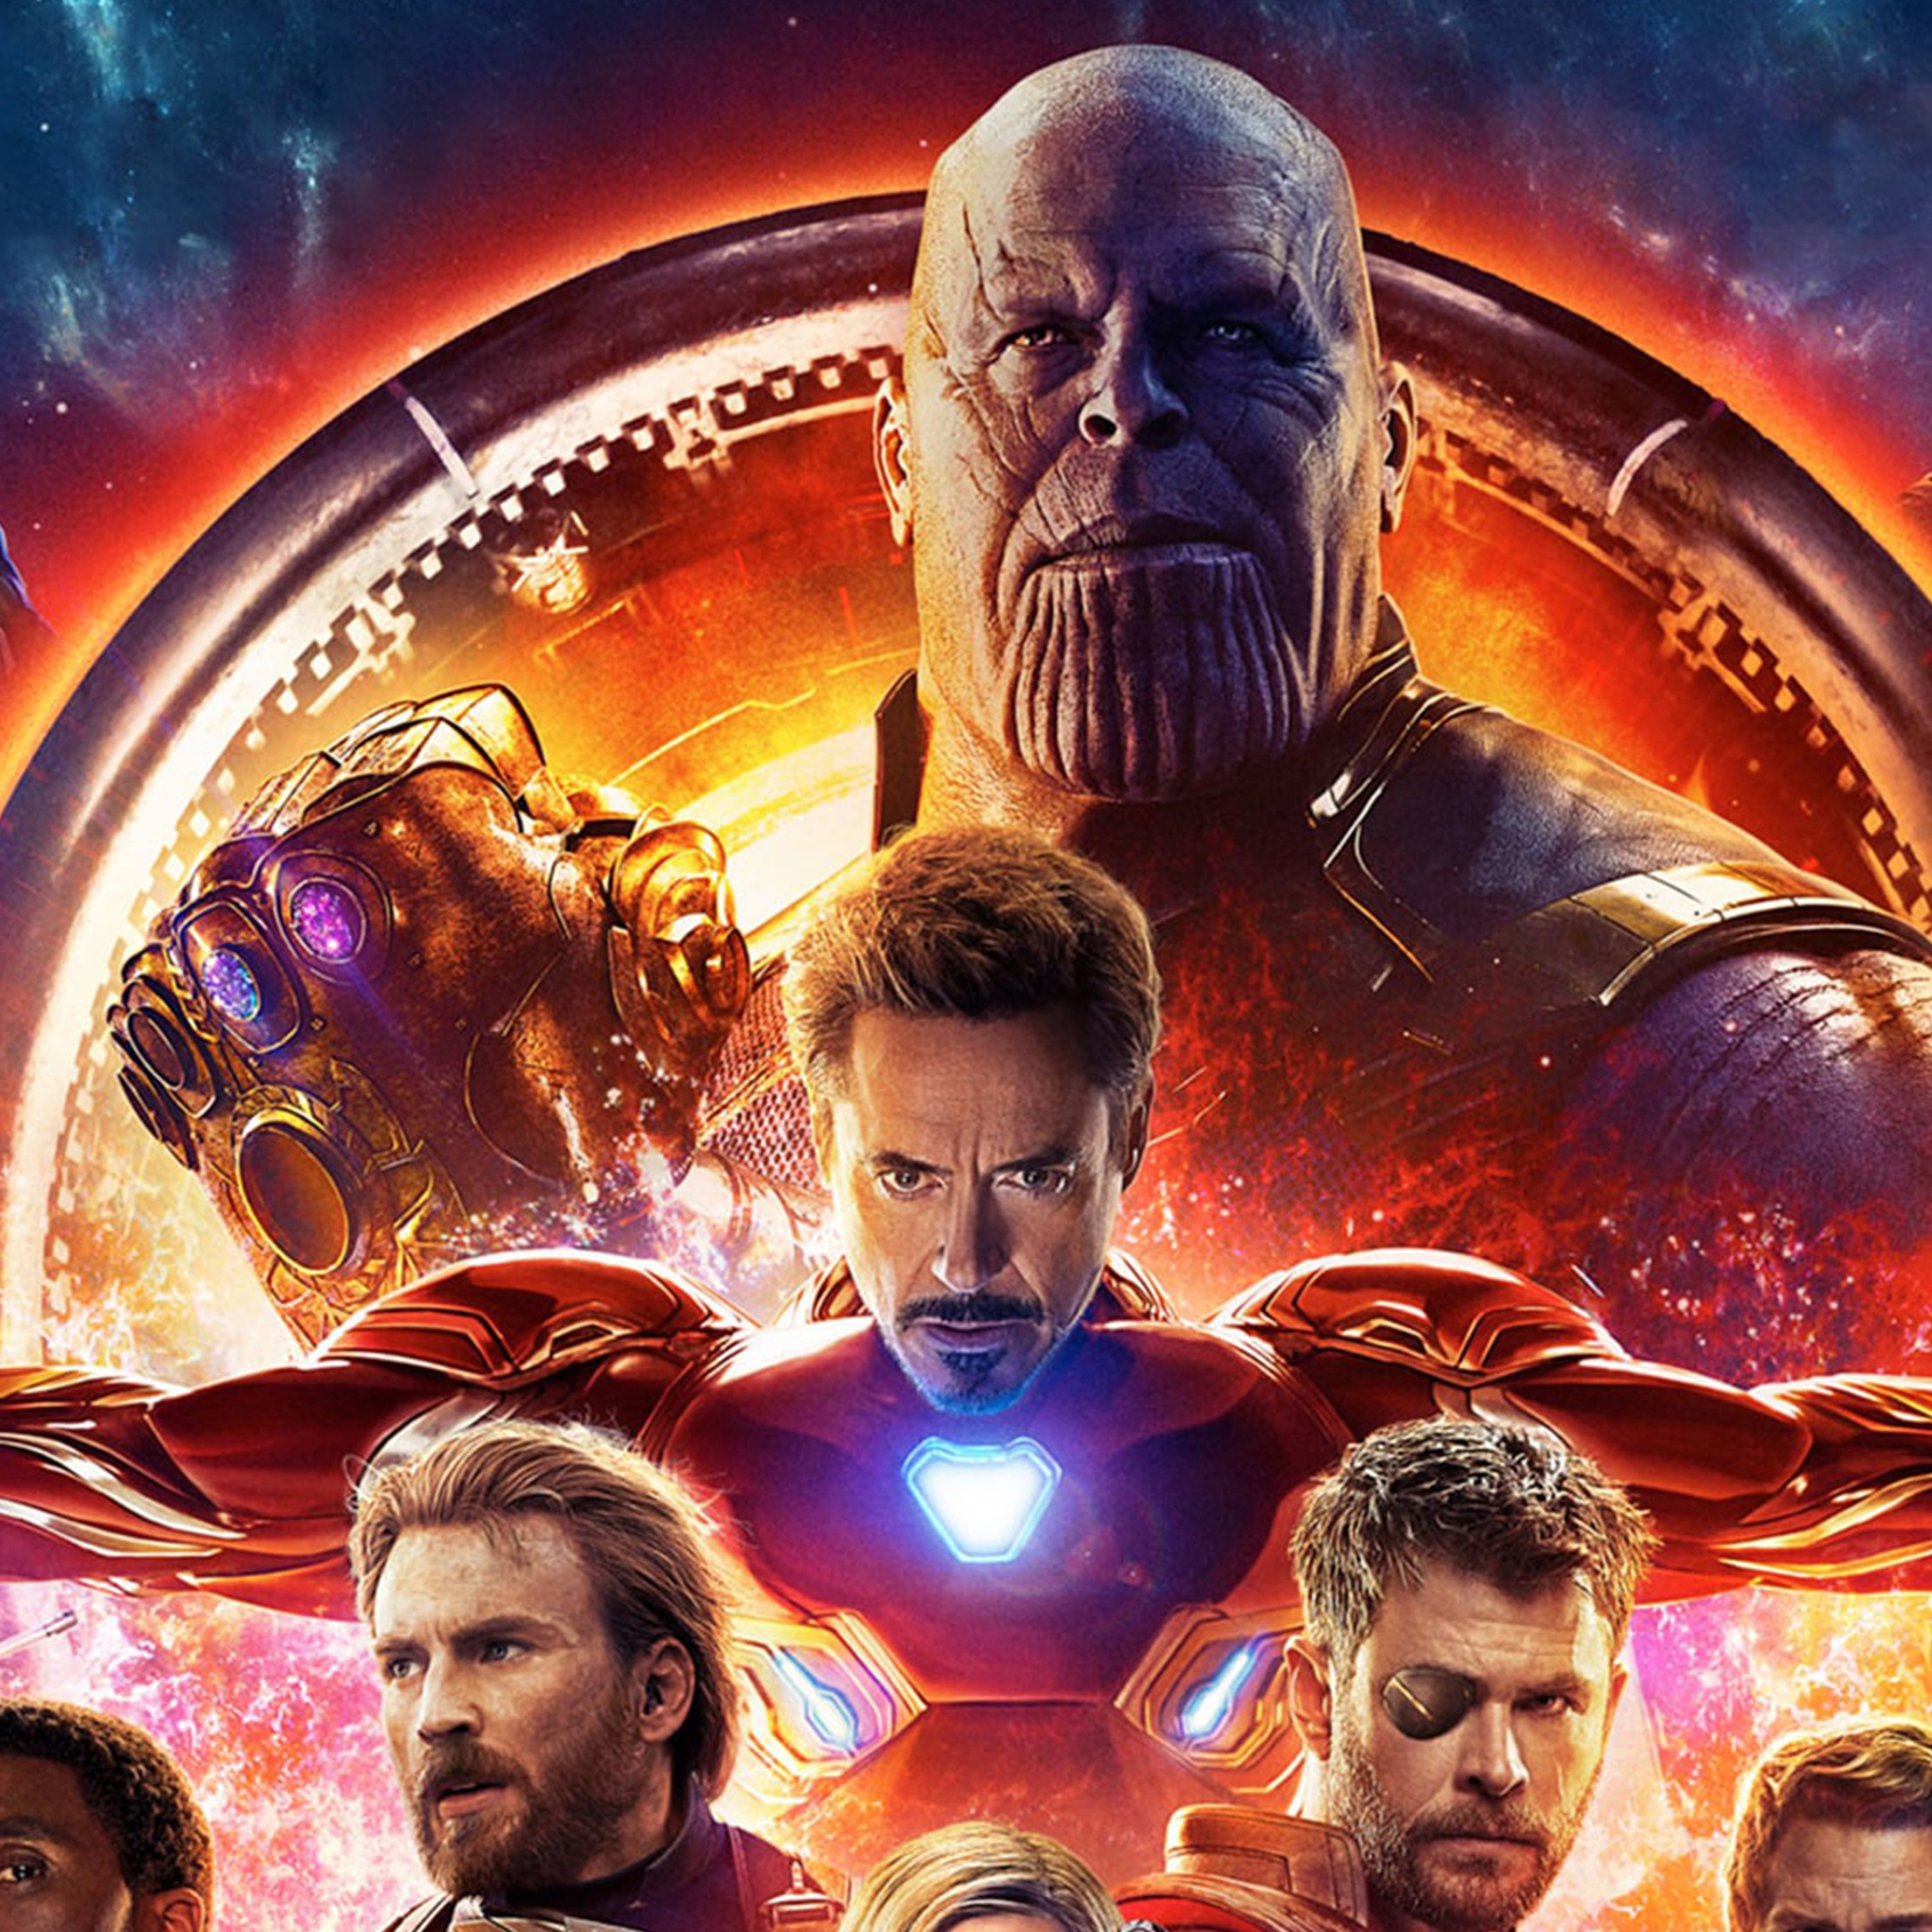 2932x2932 Avengers Infinity War 2018 4k Poster Ipad Pro ...